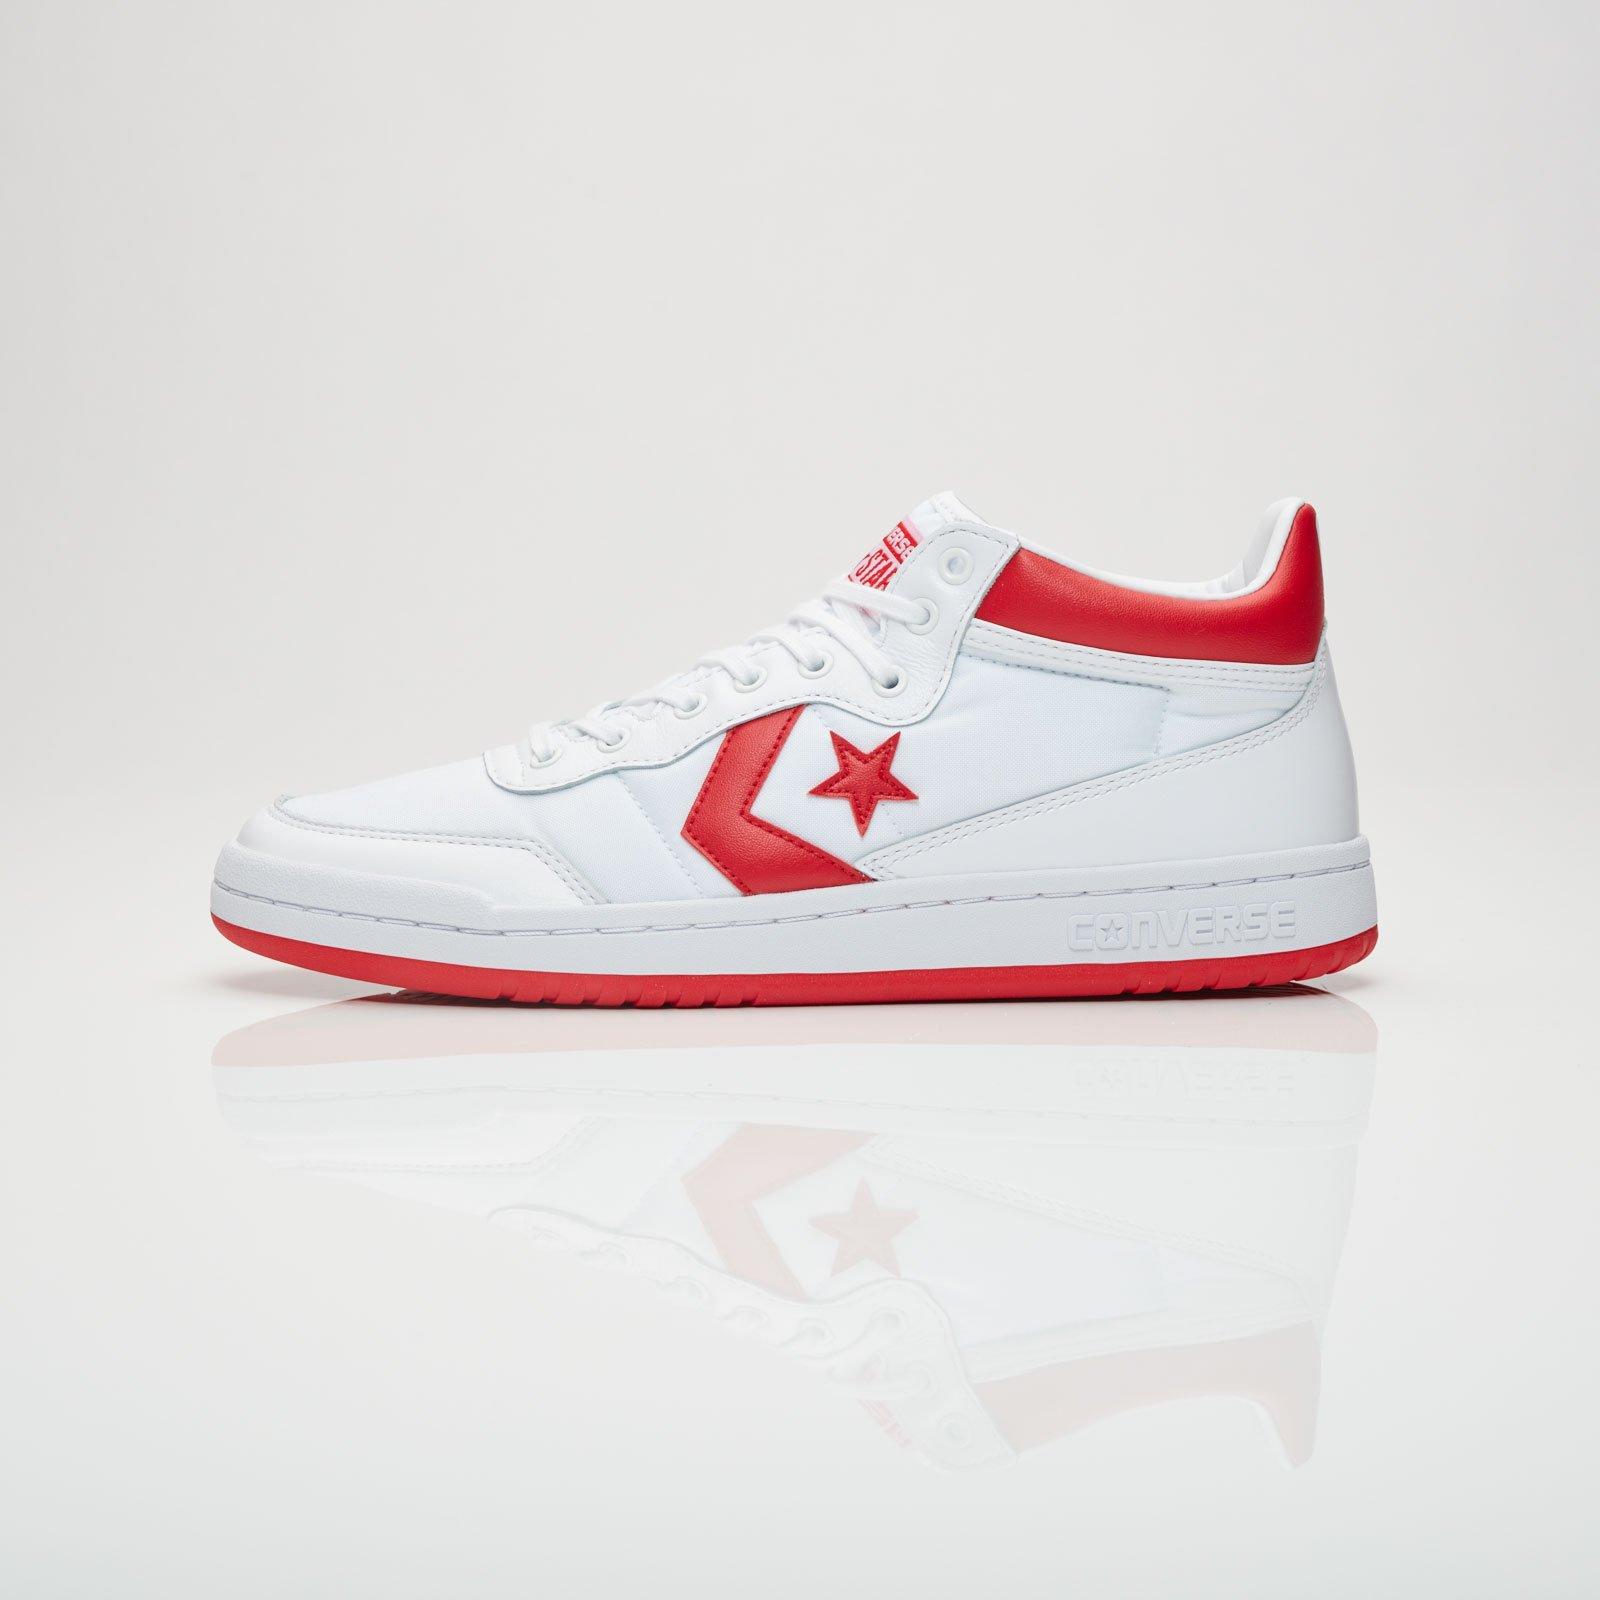 6fd33812c9ed51 Converse Fastbreak 83 Mid - 155651c - Sneakersnstuff